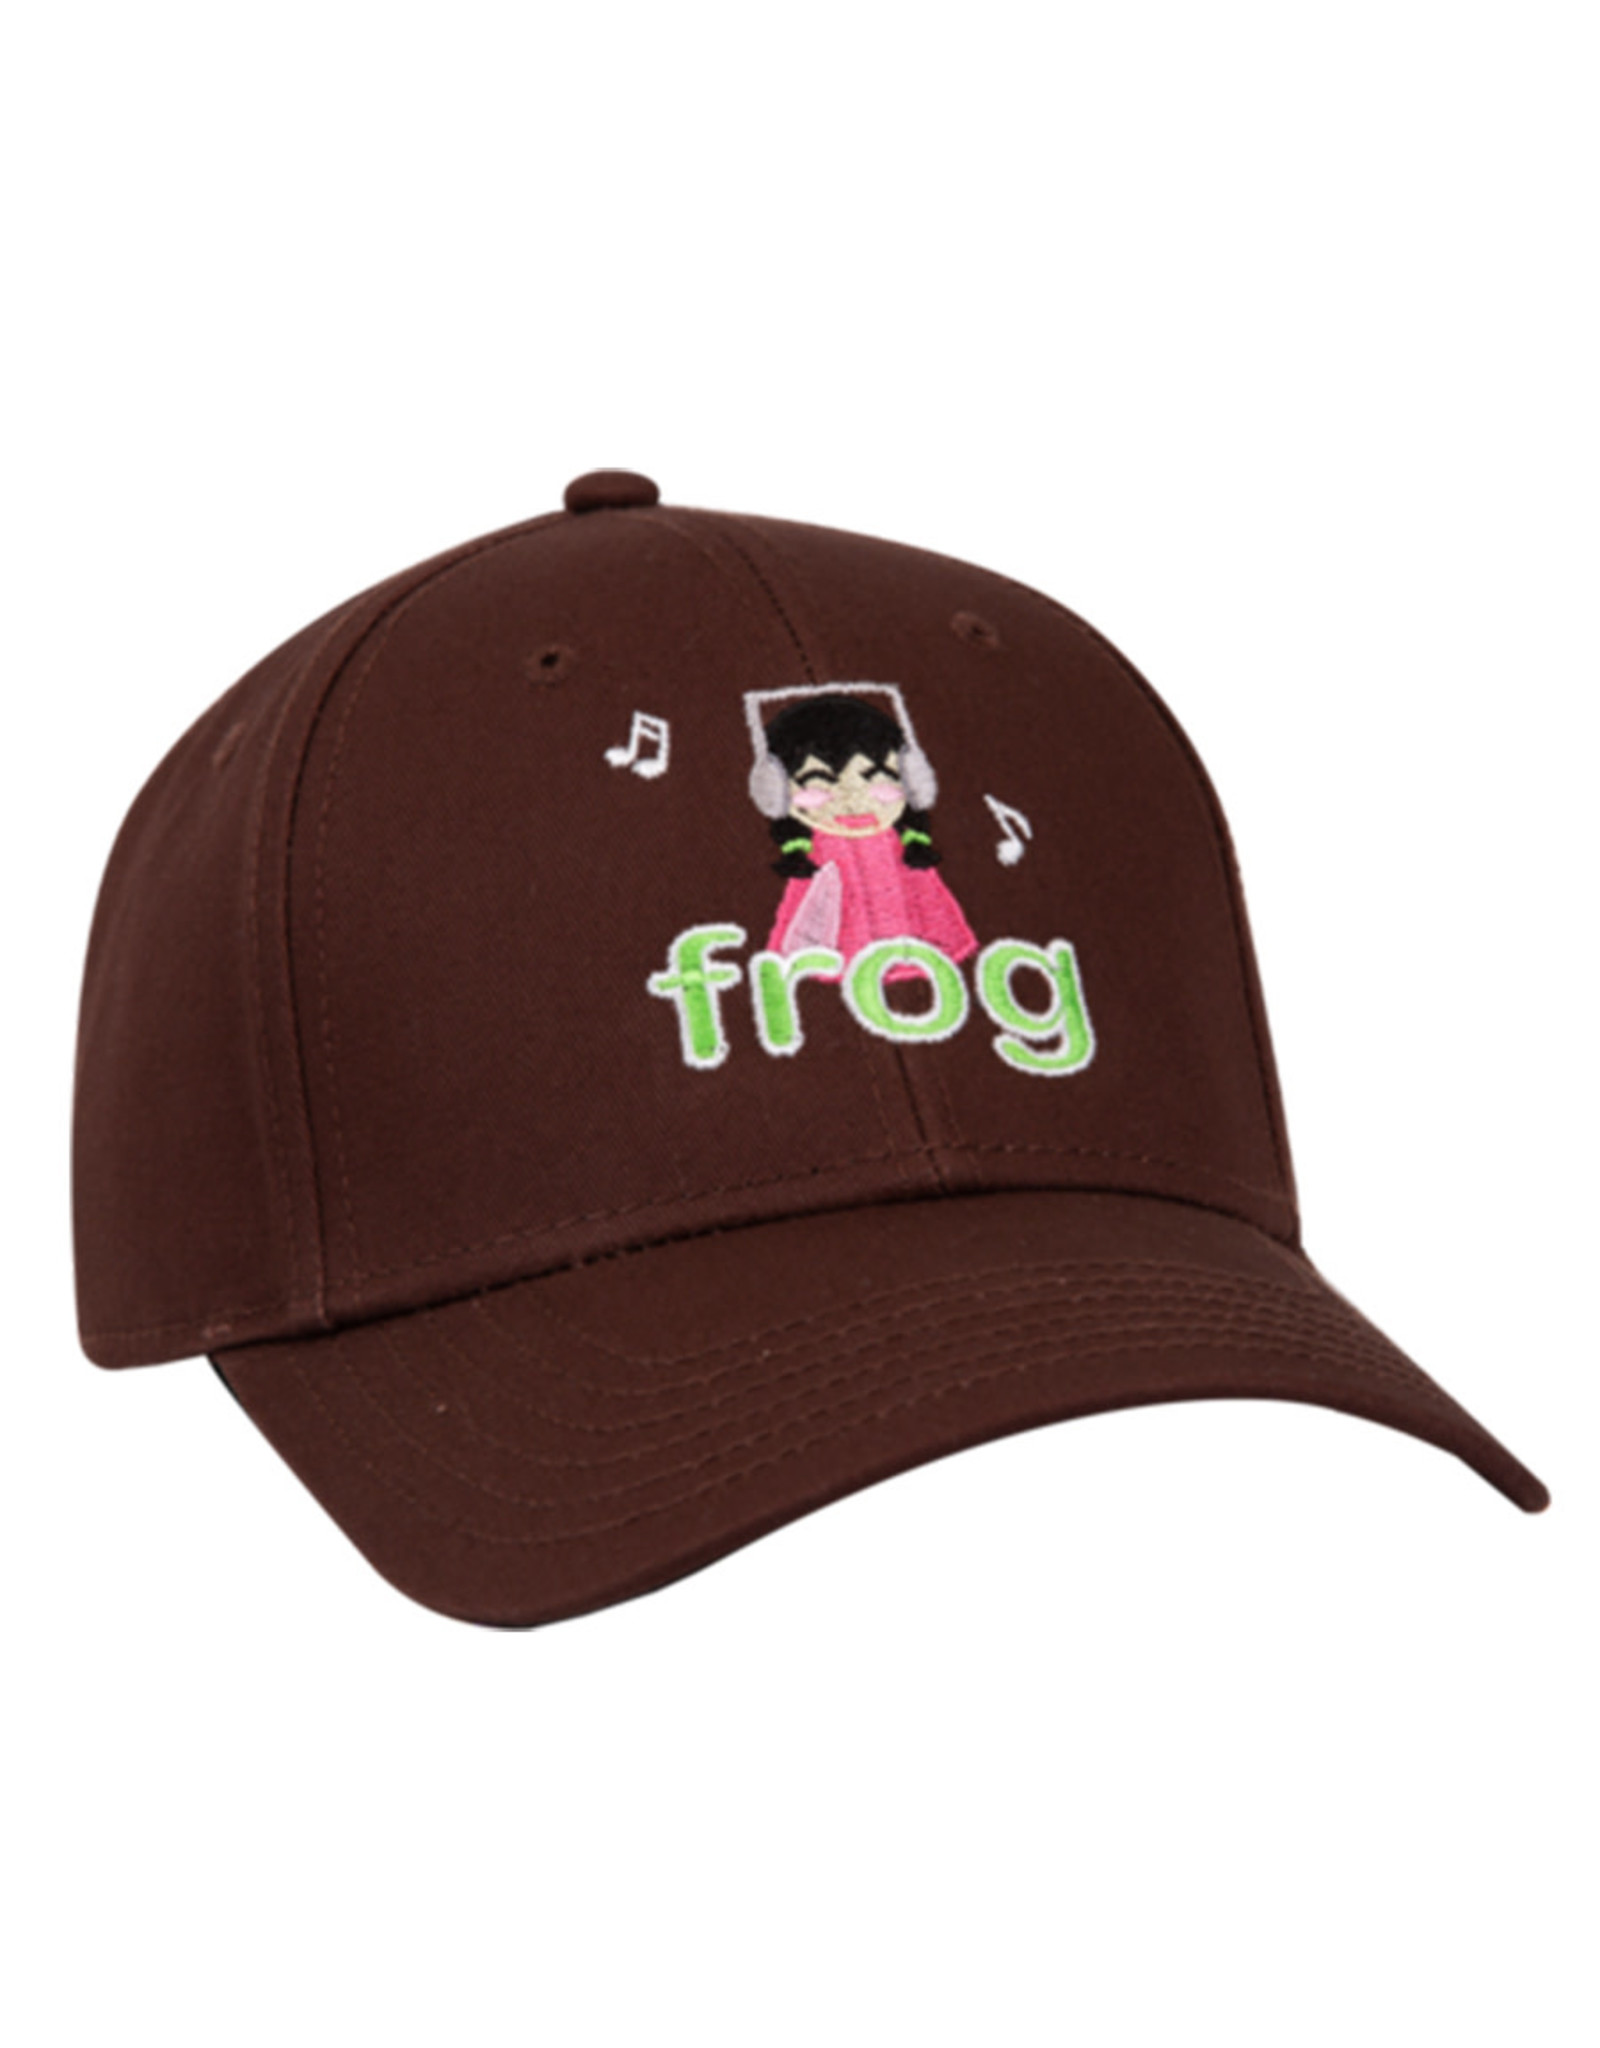 Frog Frog Hat Im Not Listening 6 Panel Strapback (Brown)